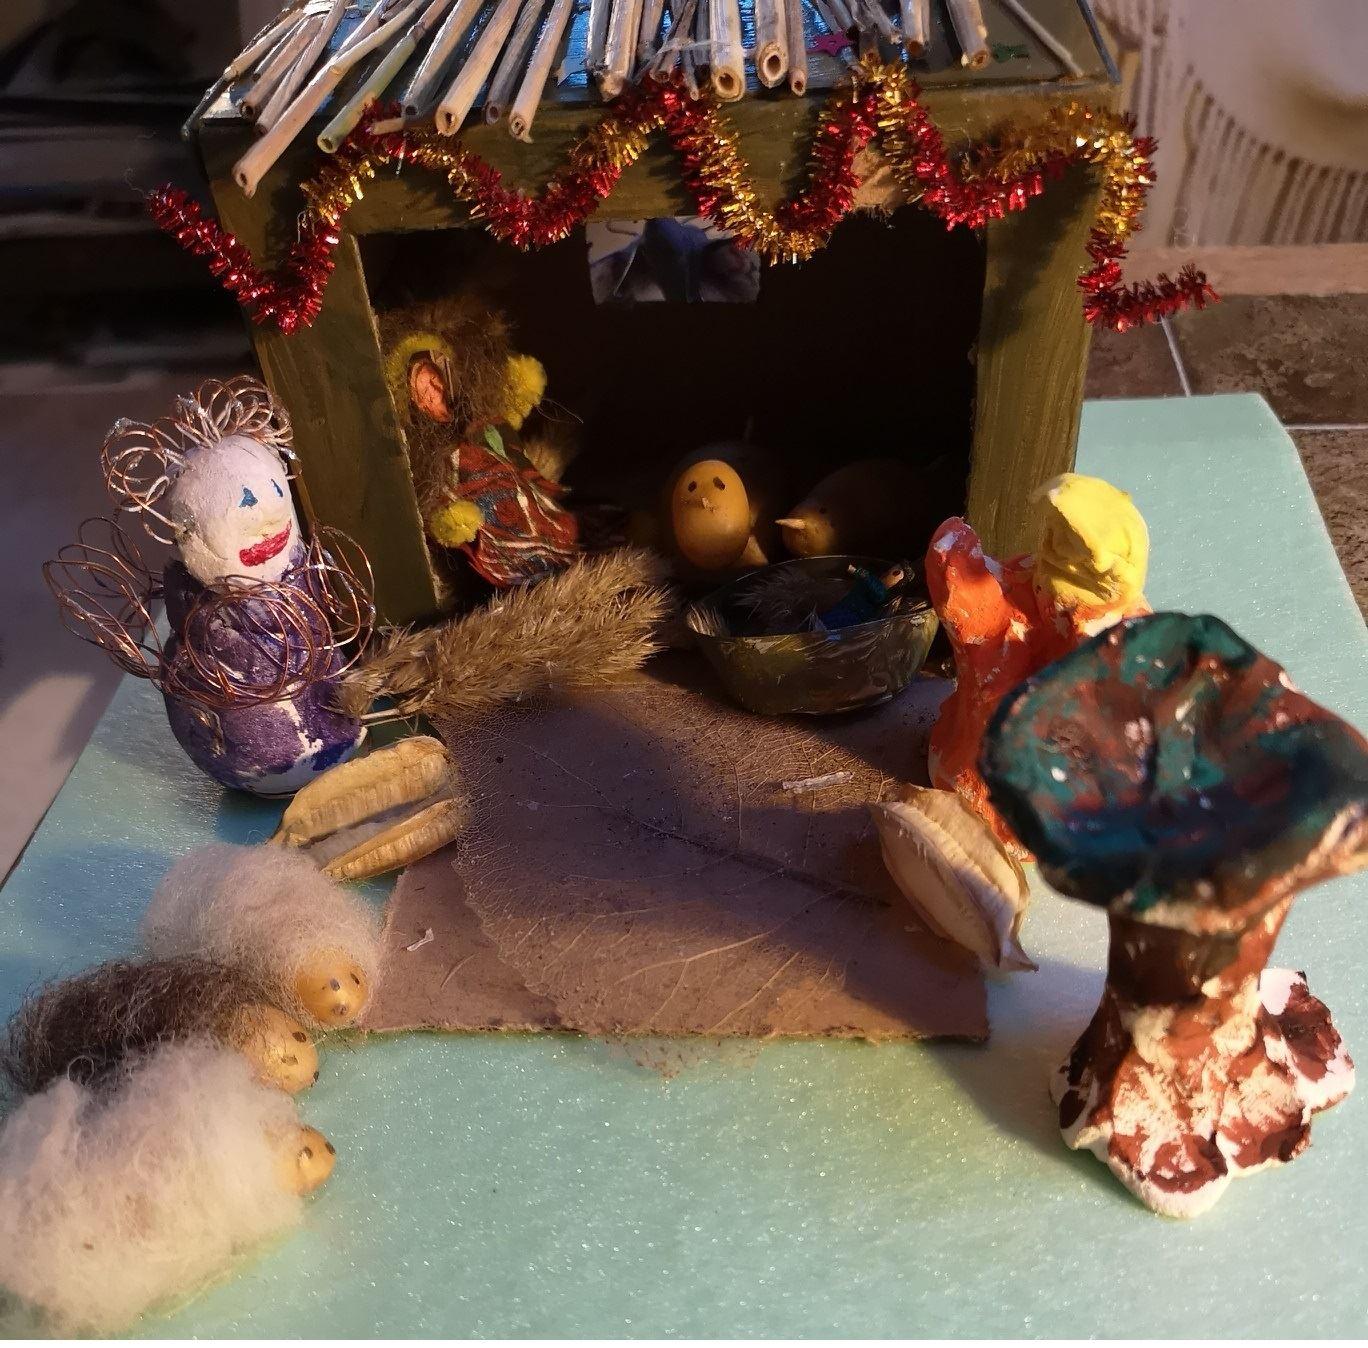 Lav din egen julekrybbe hos Culthus i Nykøbing F.